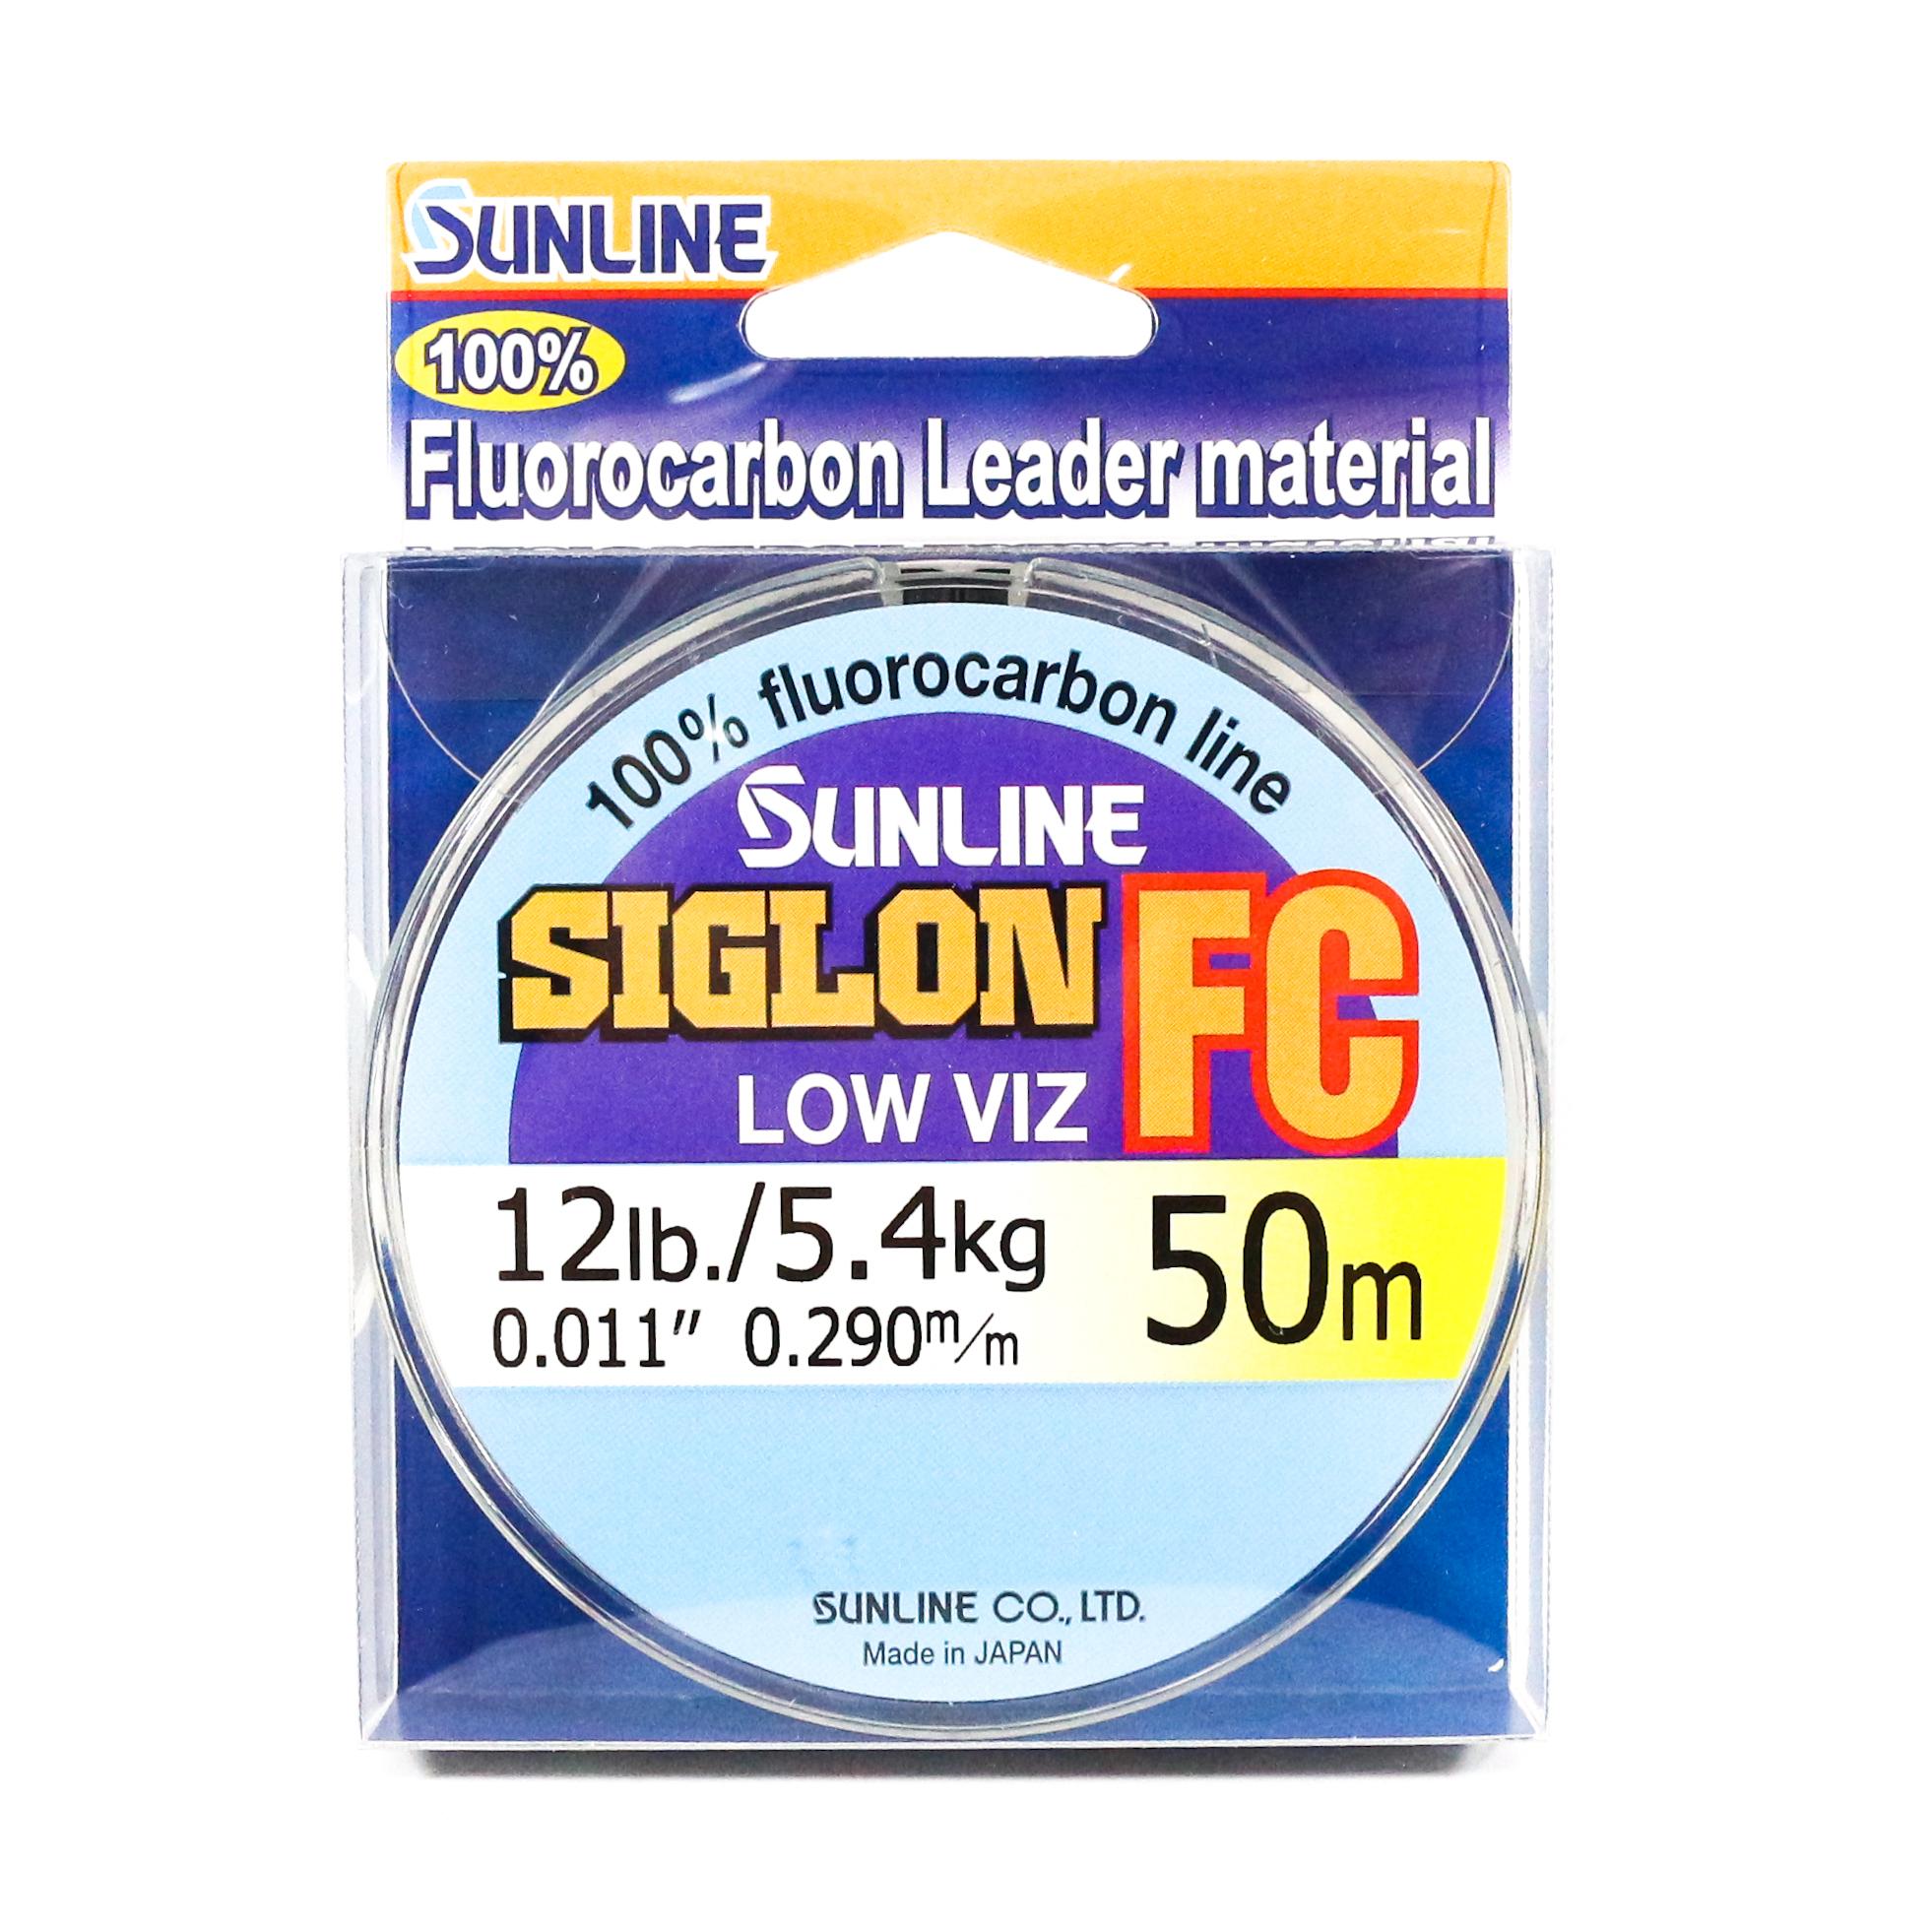 Sunline Siglon FC Fluorocarbon Line 50m 12lb Diameter 0.29 mm (5860)